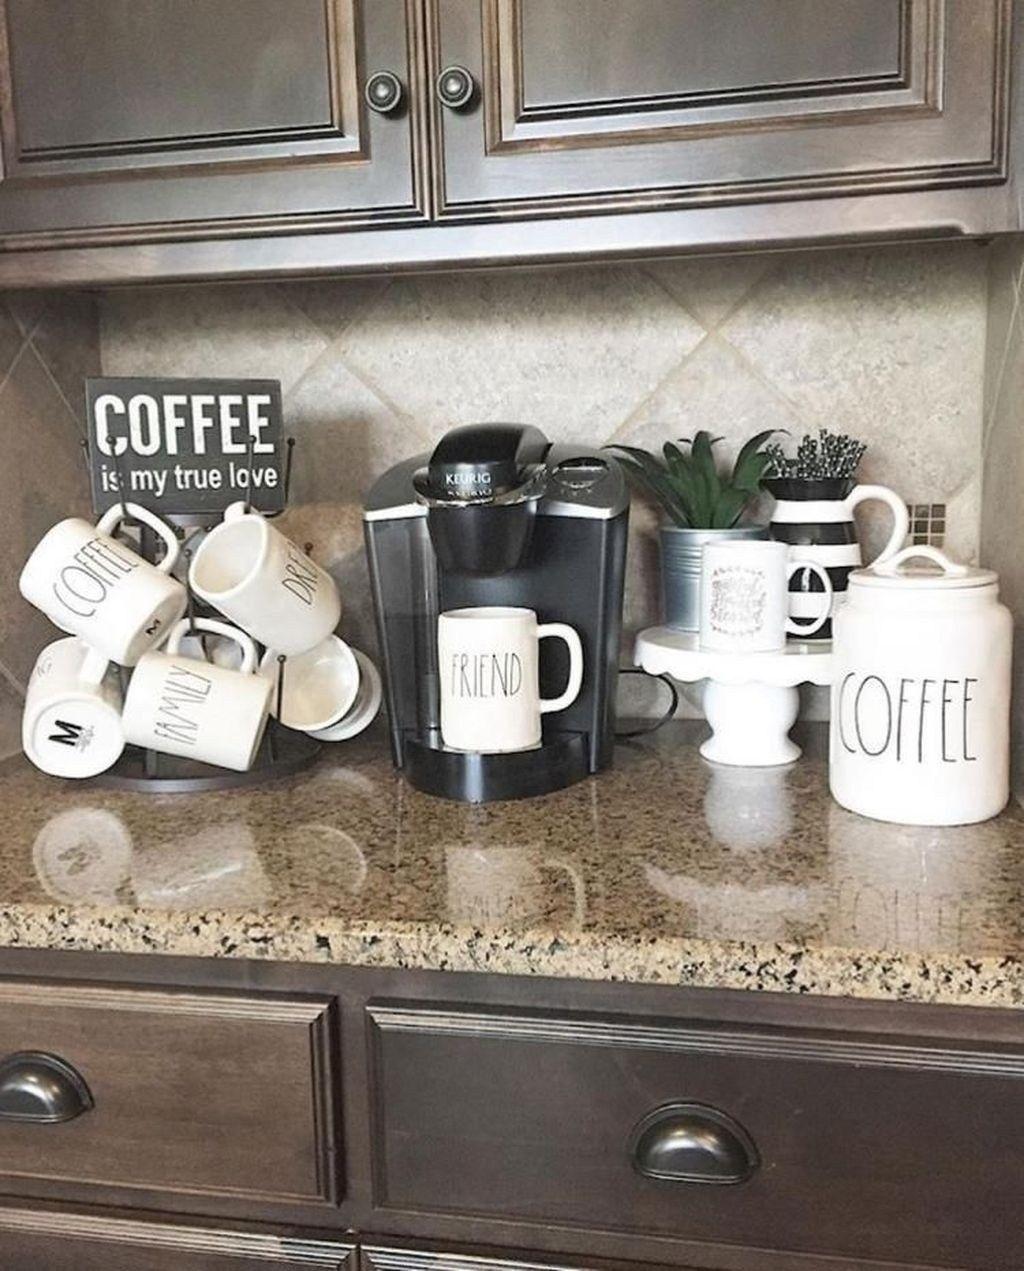 Stunning Diy Mini Coffee Bar Design Ideas For Your Home 01 home #remodelling #stunning #diy #mini #coffee #bar #design #ideas #for #your #home #01